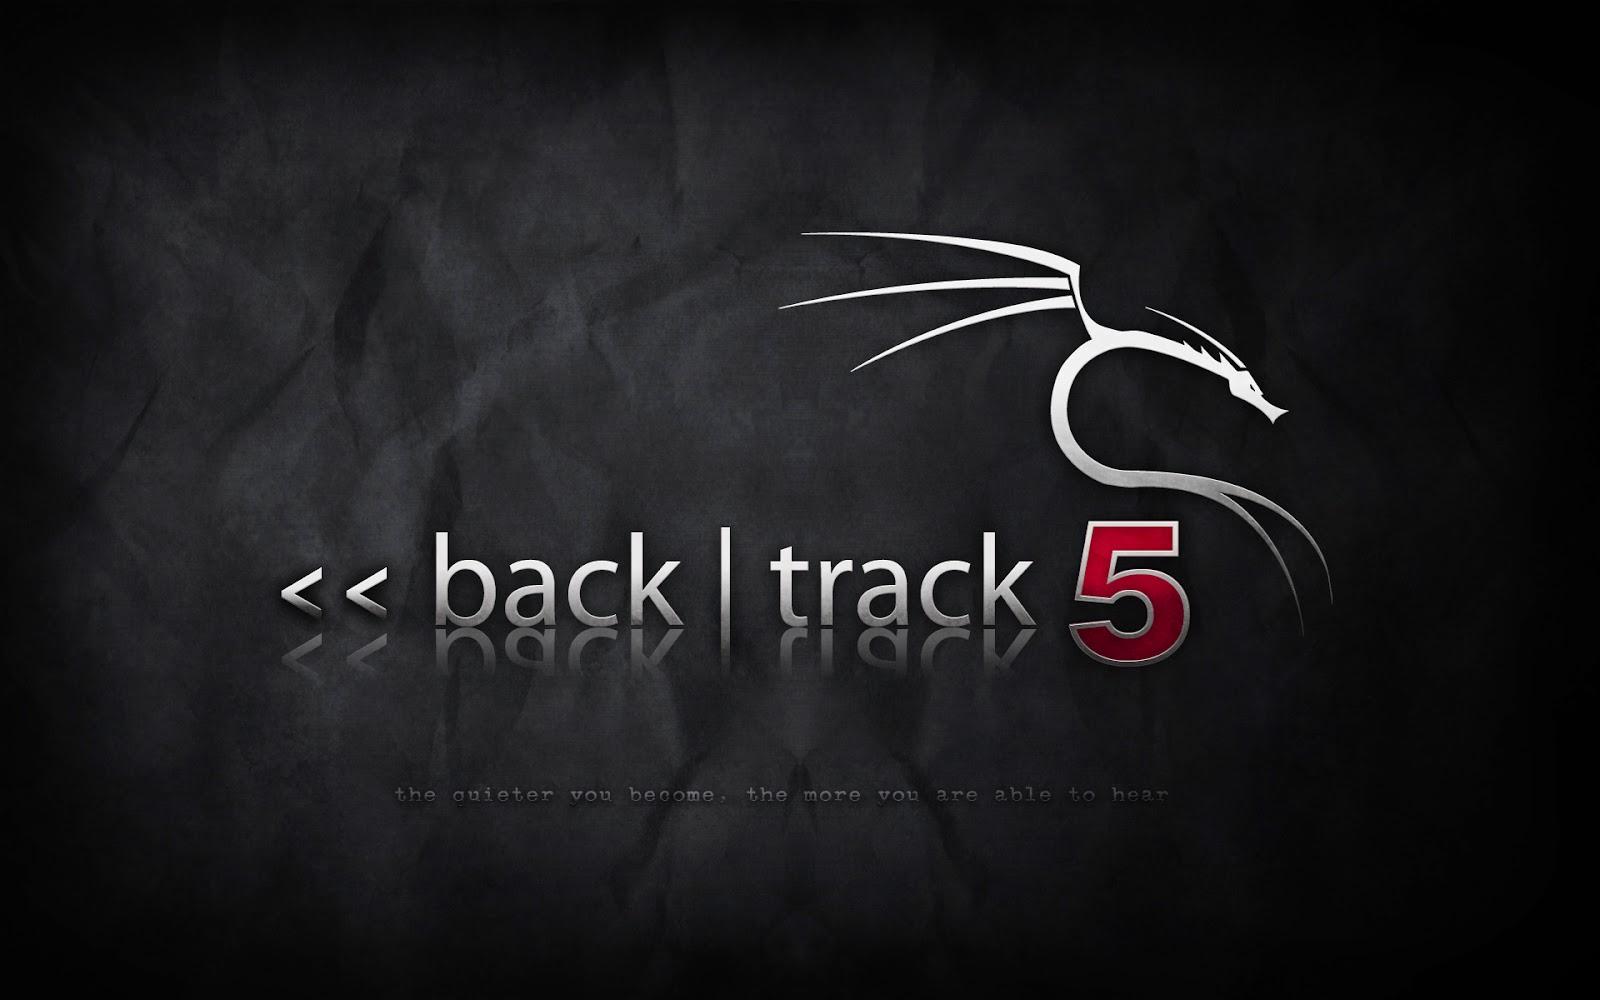 Backtrack 5 Wireless Penetration Testing Beginners Guide -4425